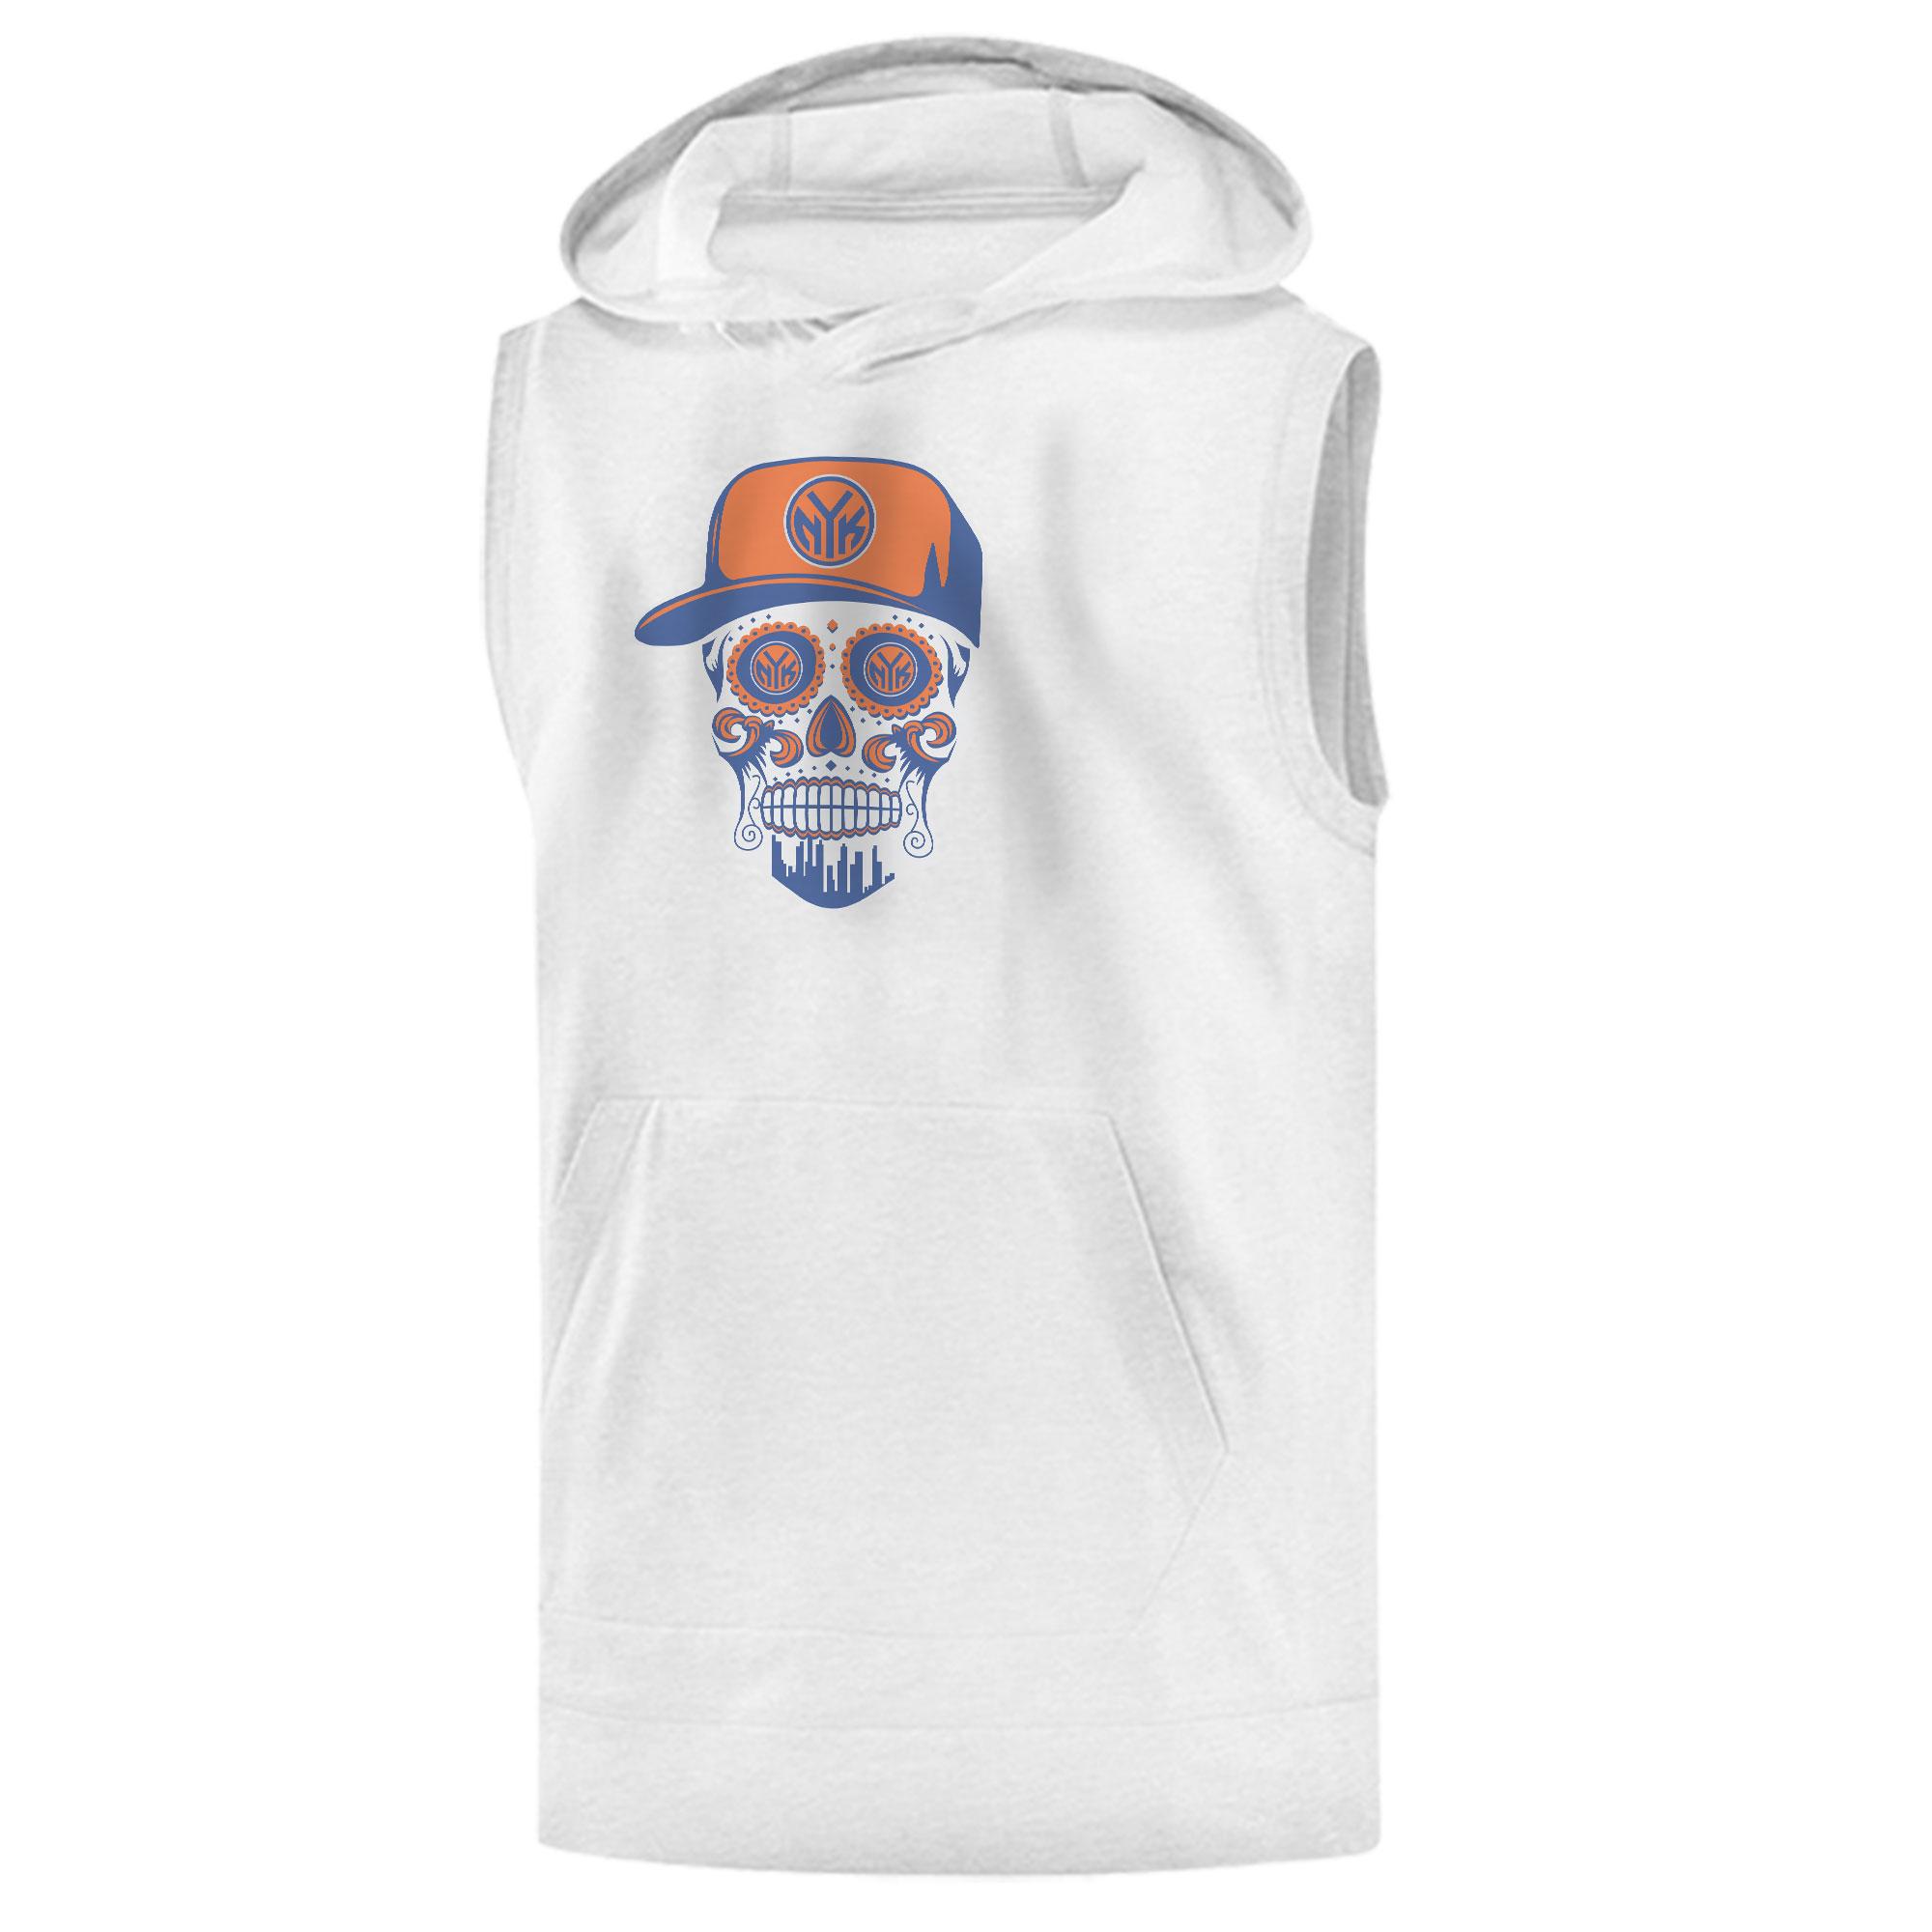 Knicks Skull Sleeveless (KLS-WHT-NP-458-NBA-NYK-SKULL)